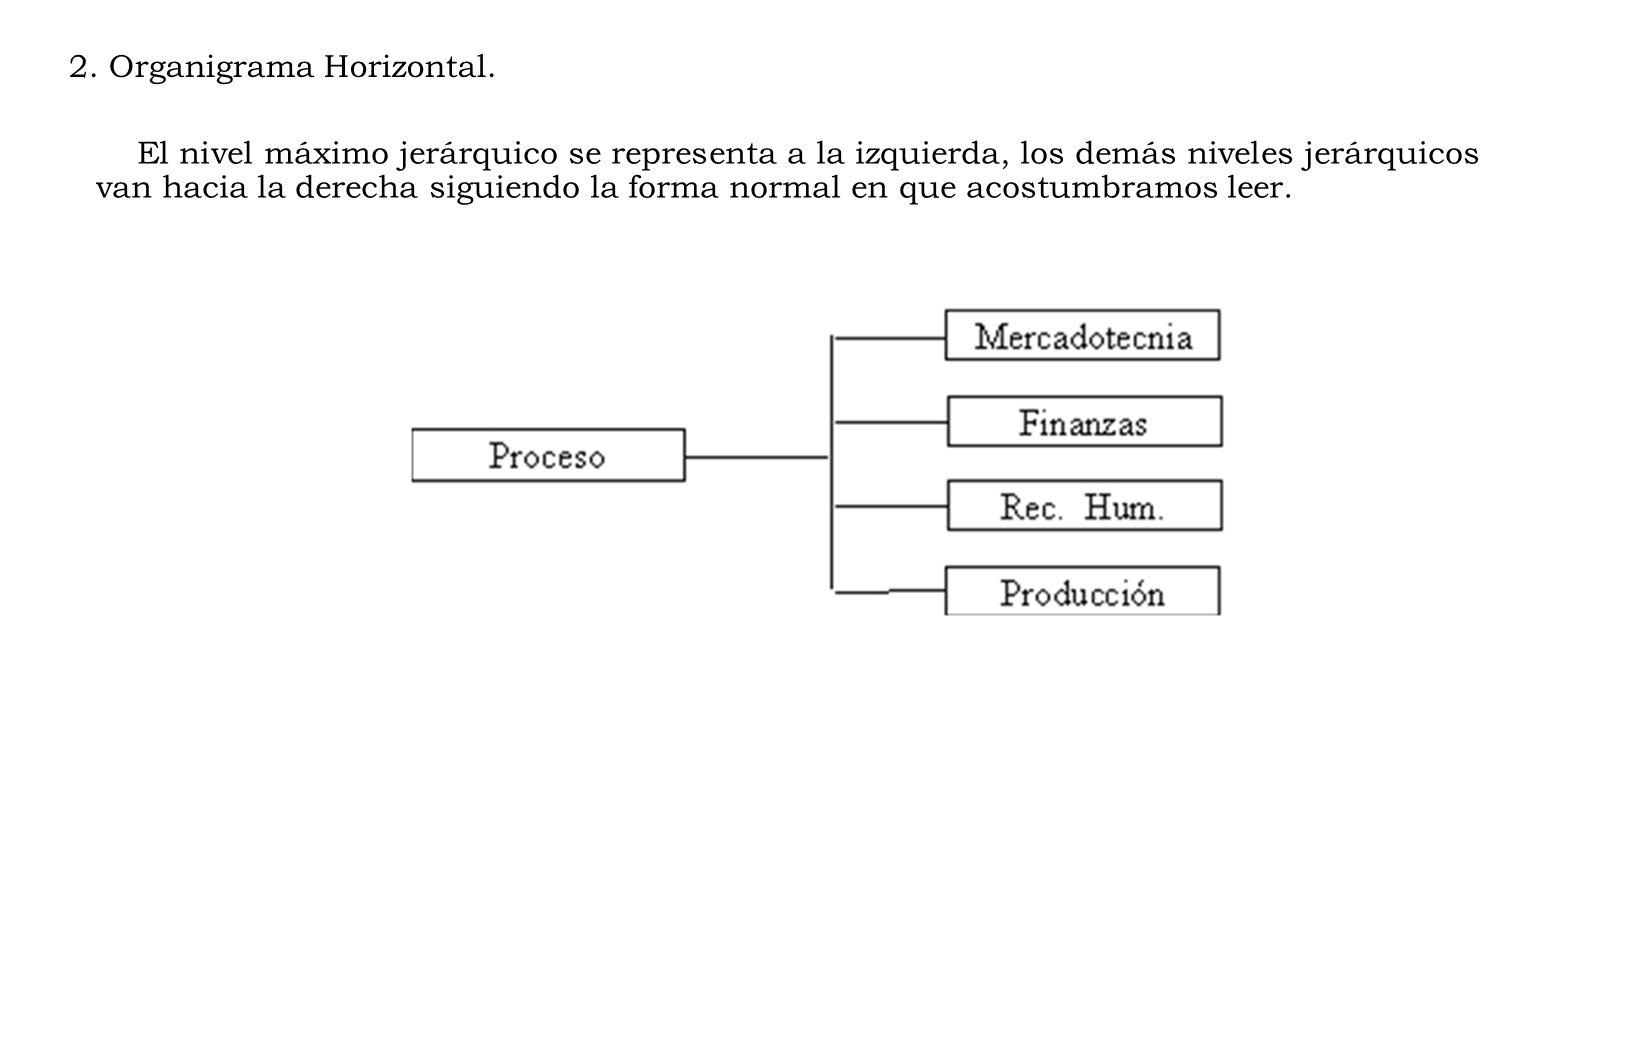 2. Organigrama Horizontal.